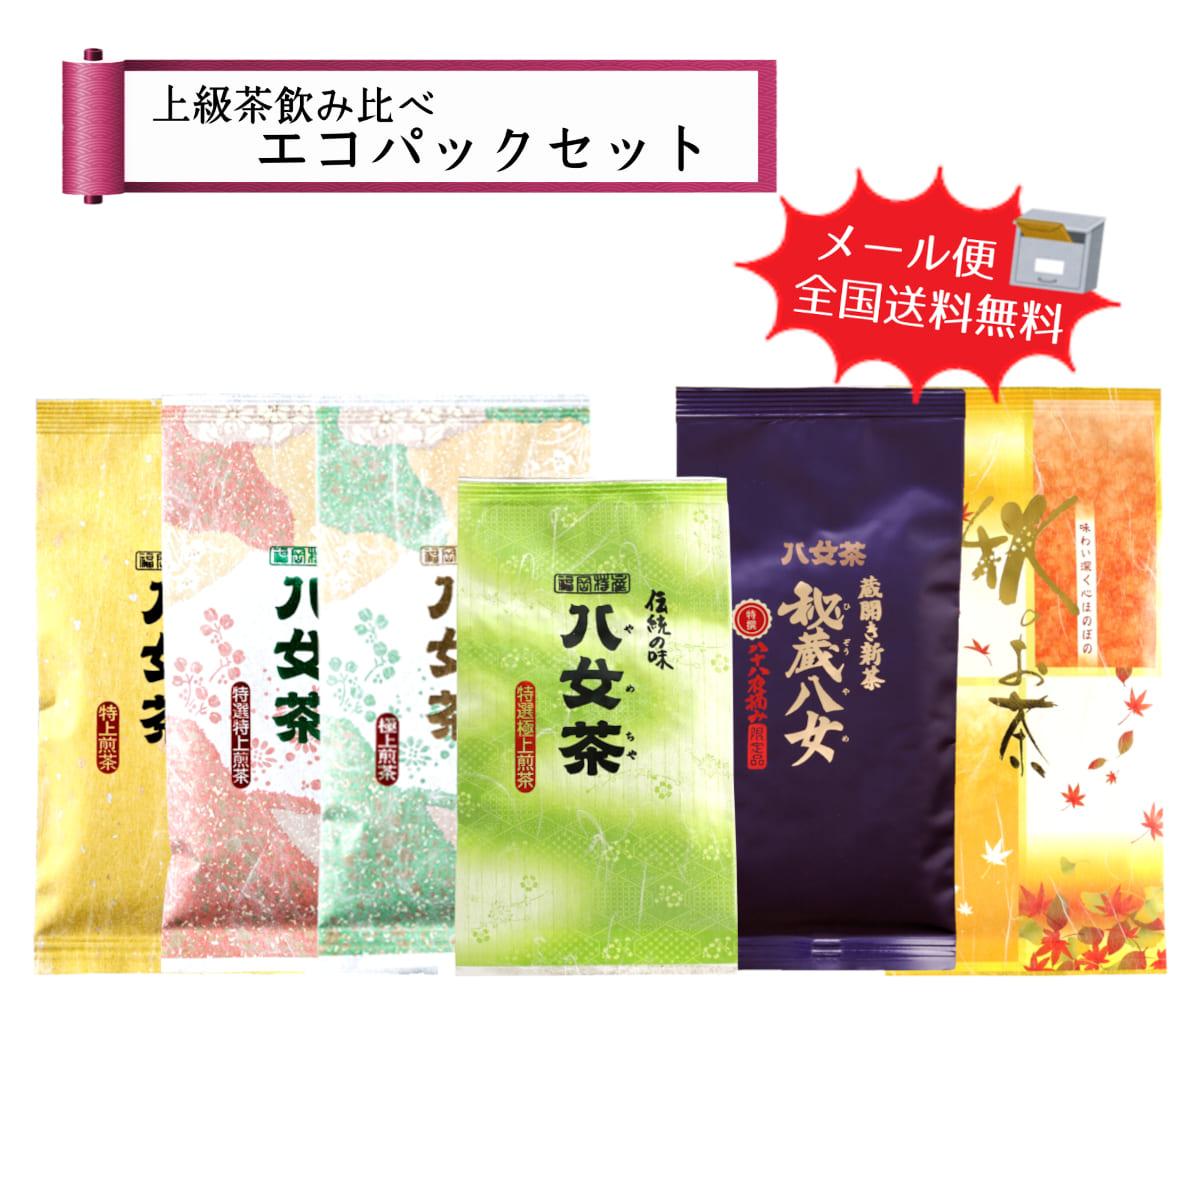 【T-231】最上級煎茶入り!上級茶飲み比べエコパックセット